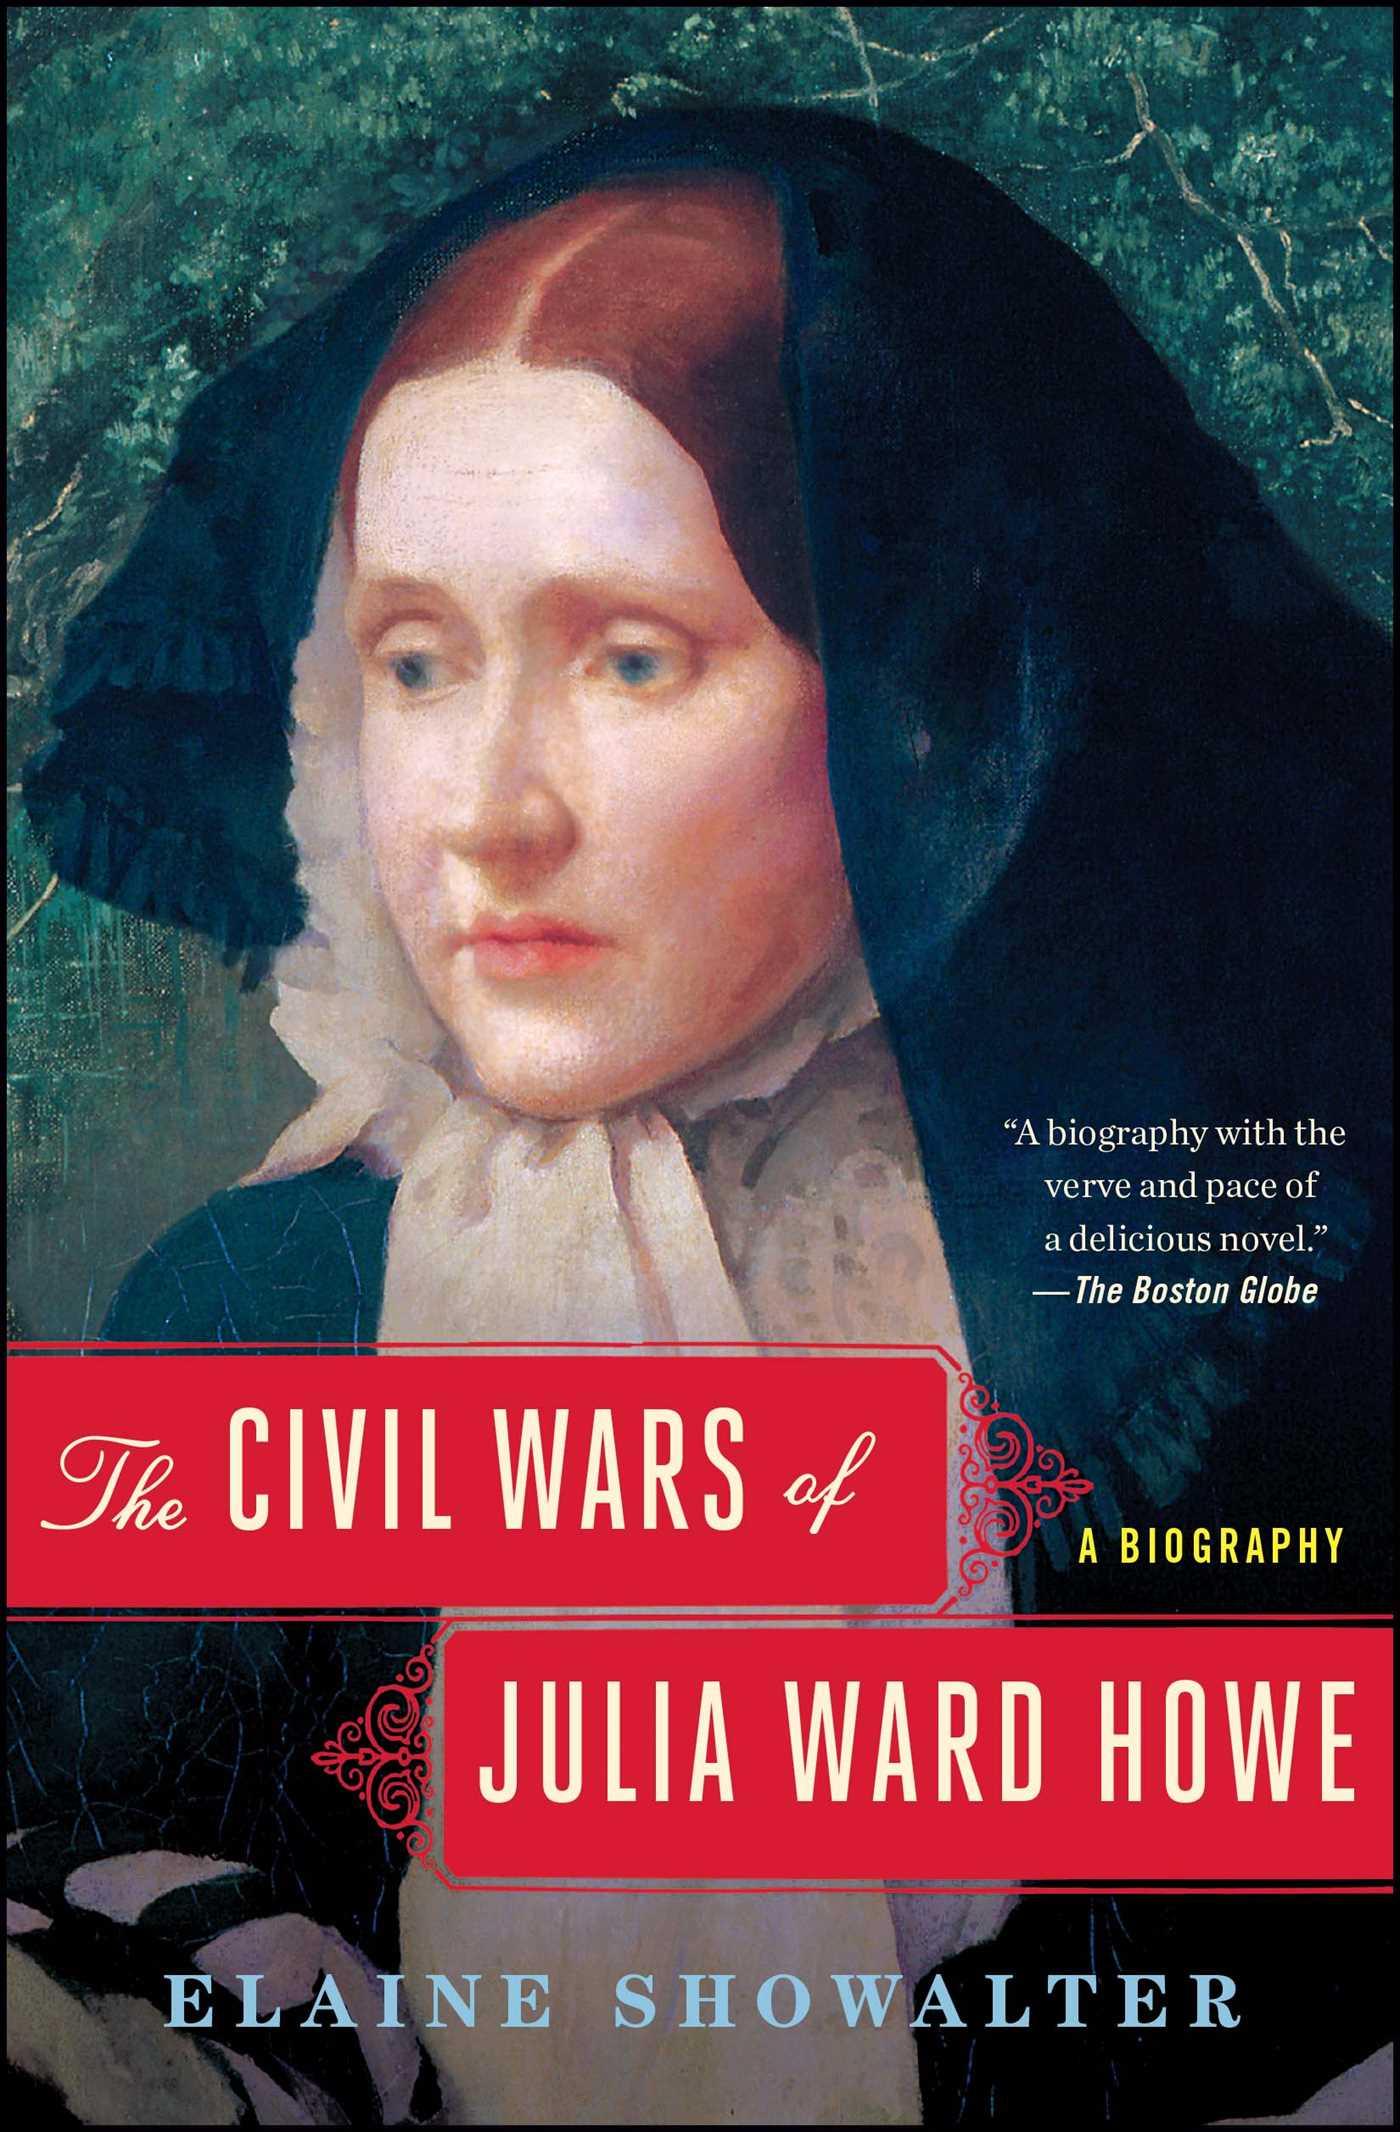 The civil wars of julia ward howe 9781451645910 hr